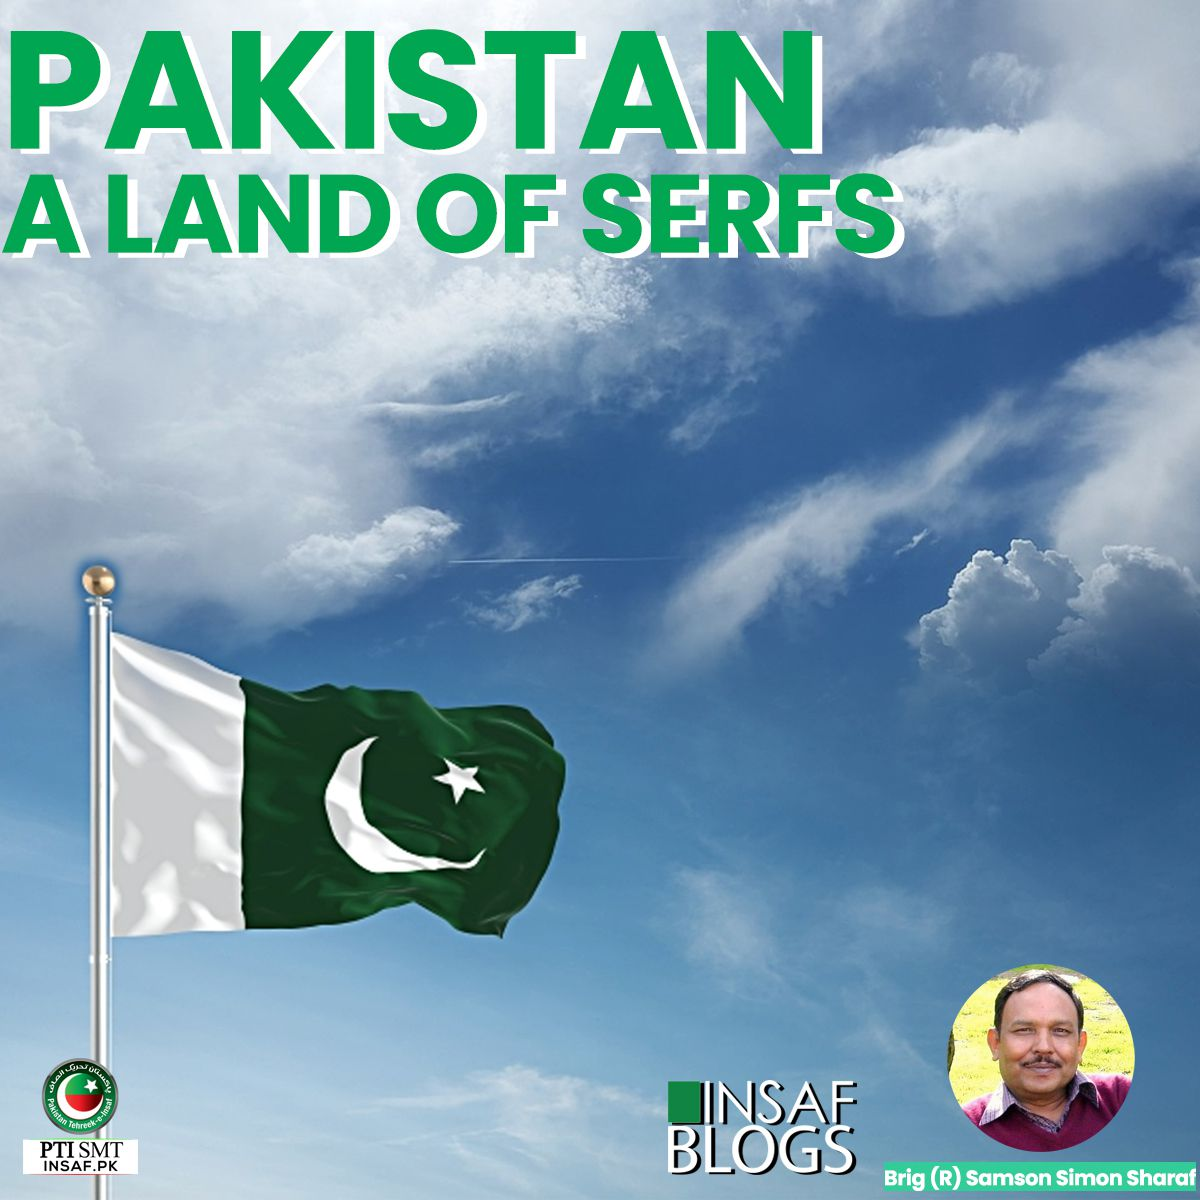 pakistan-land-serefs-insaf-blog